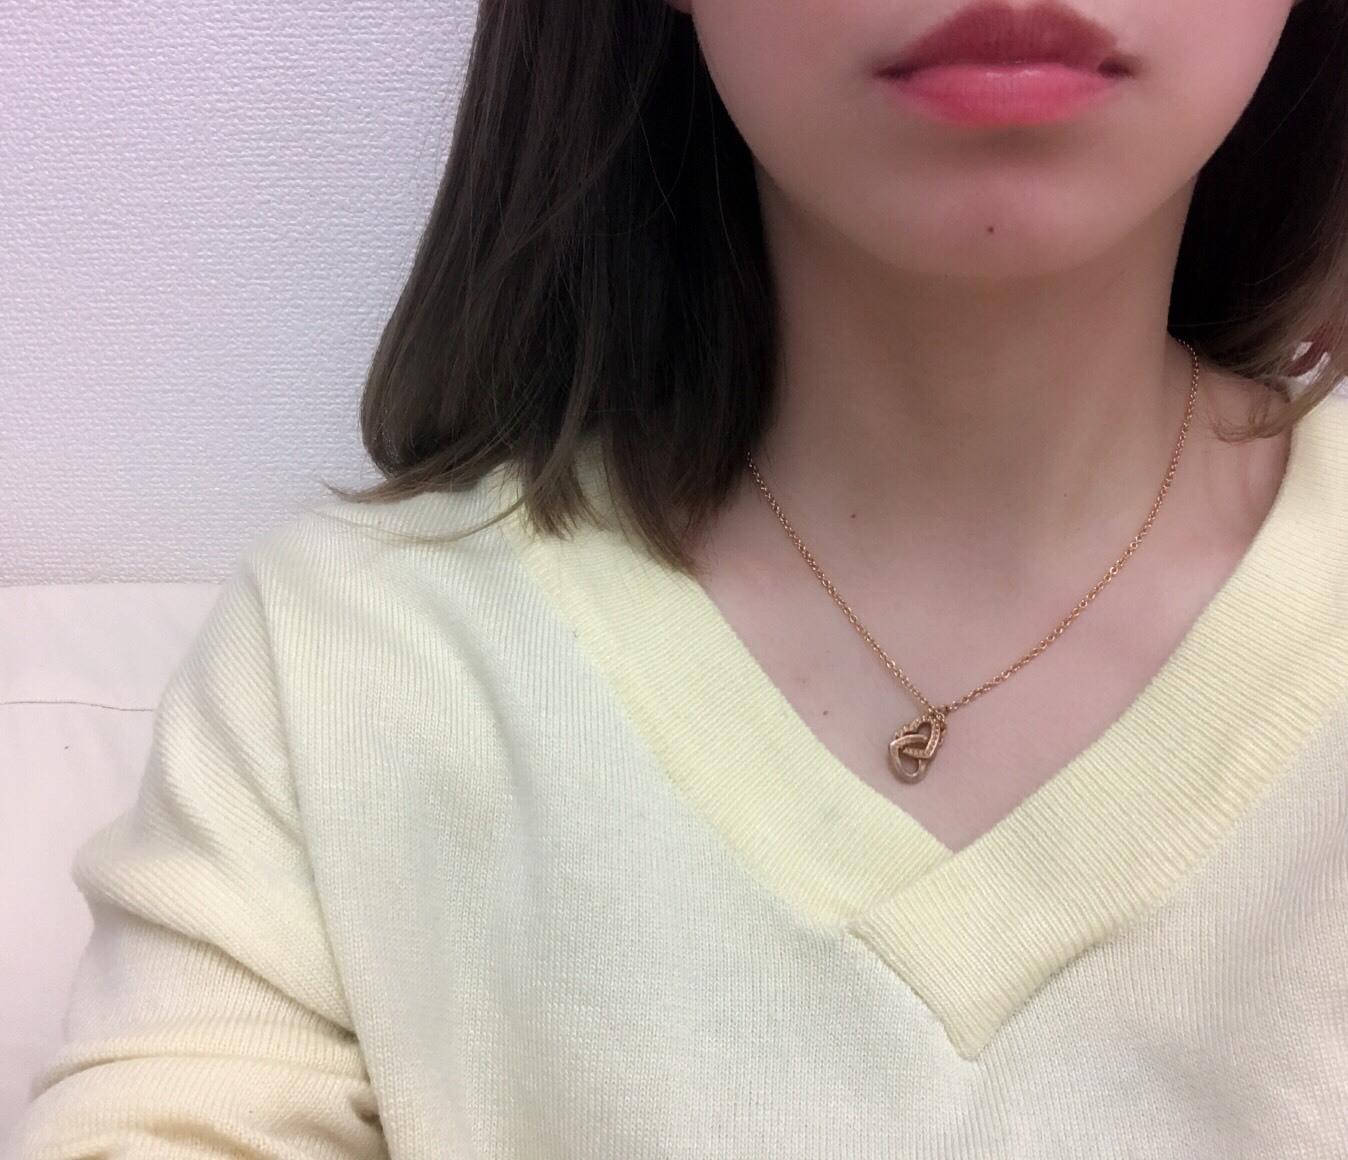 S__4087858.jpg